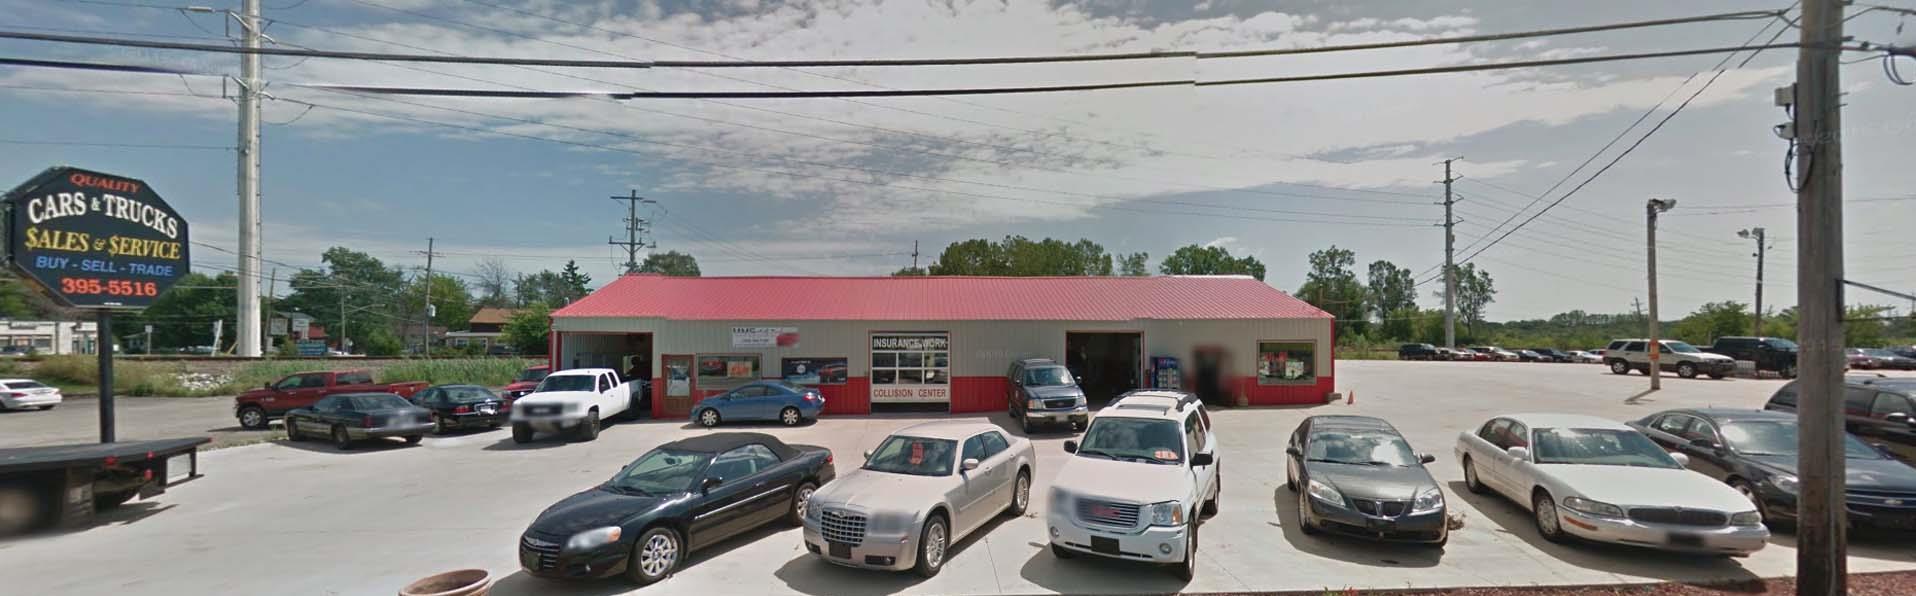 Car Dealerships Decatur Il >> Jm Motors Reviews - impremedia.net